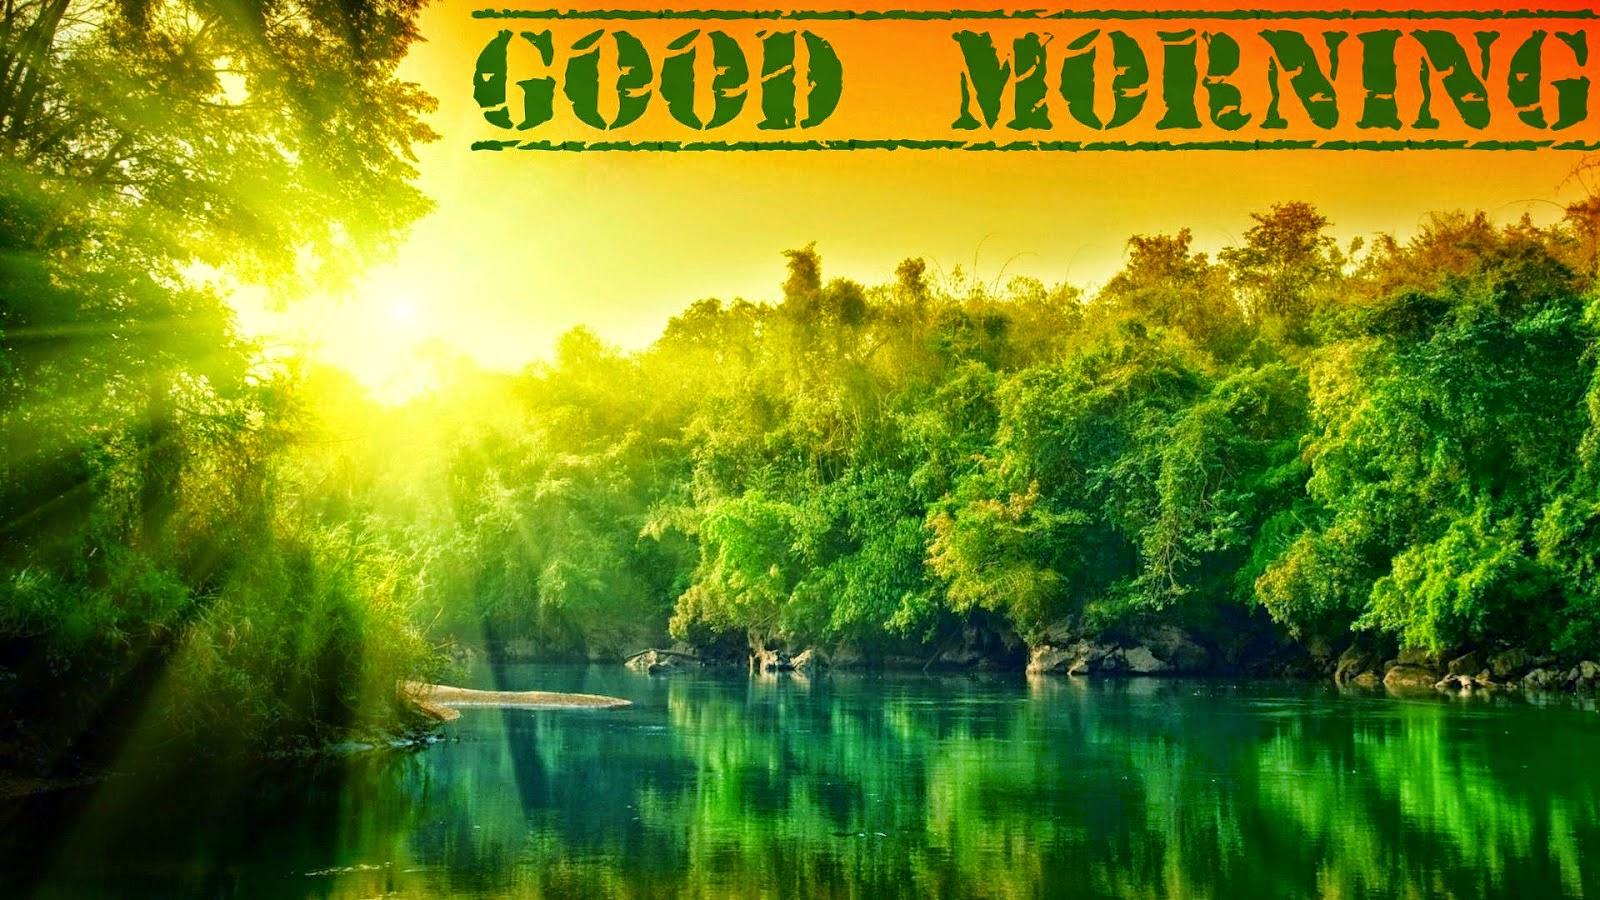 Hd wallpaper good morning - Download Free Hd Good Morning Wallpaper